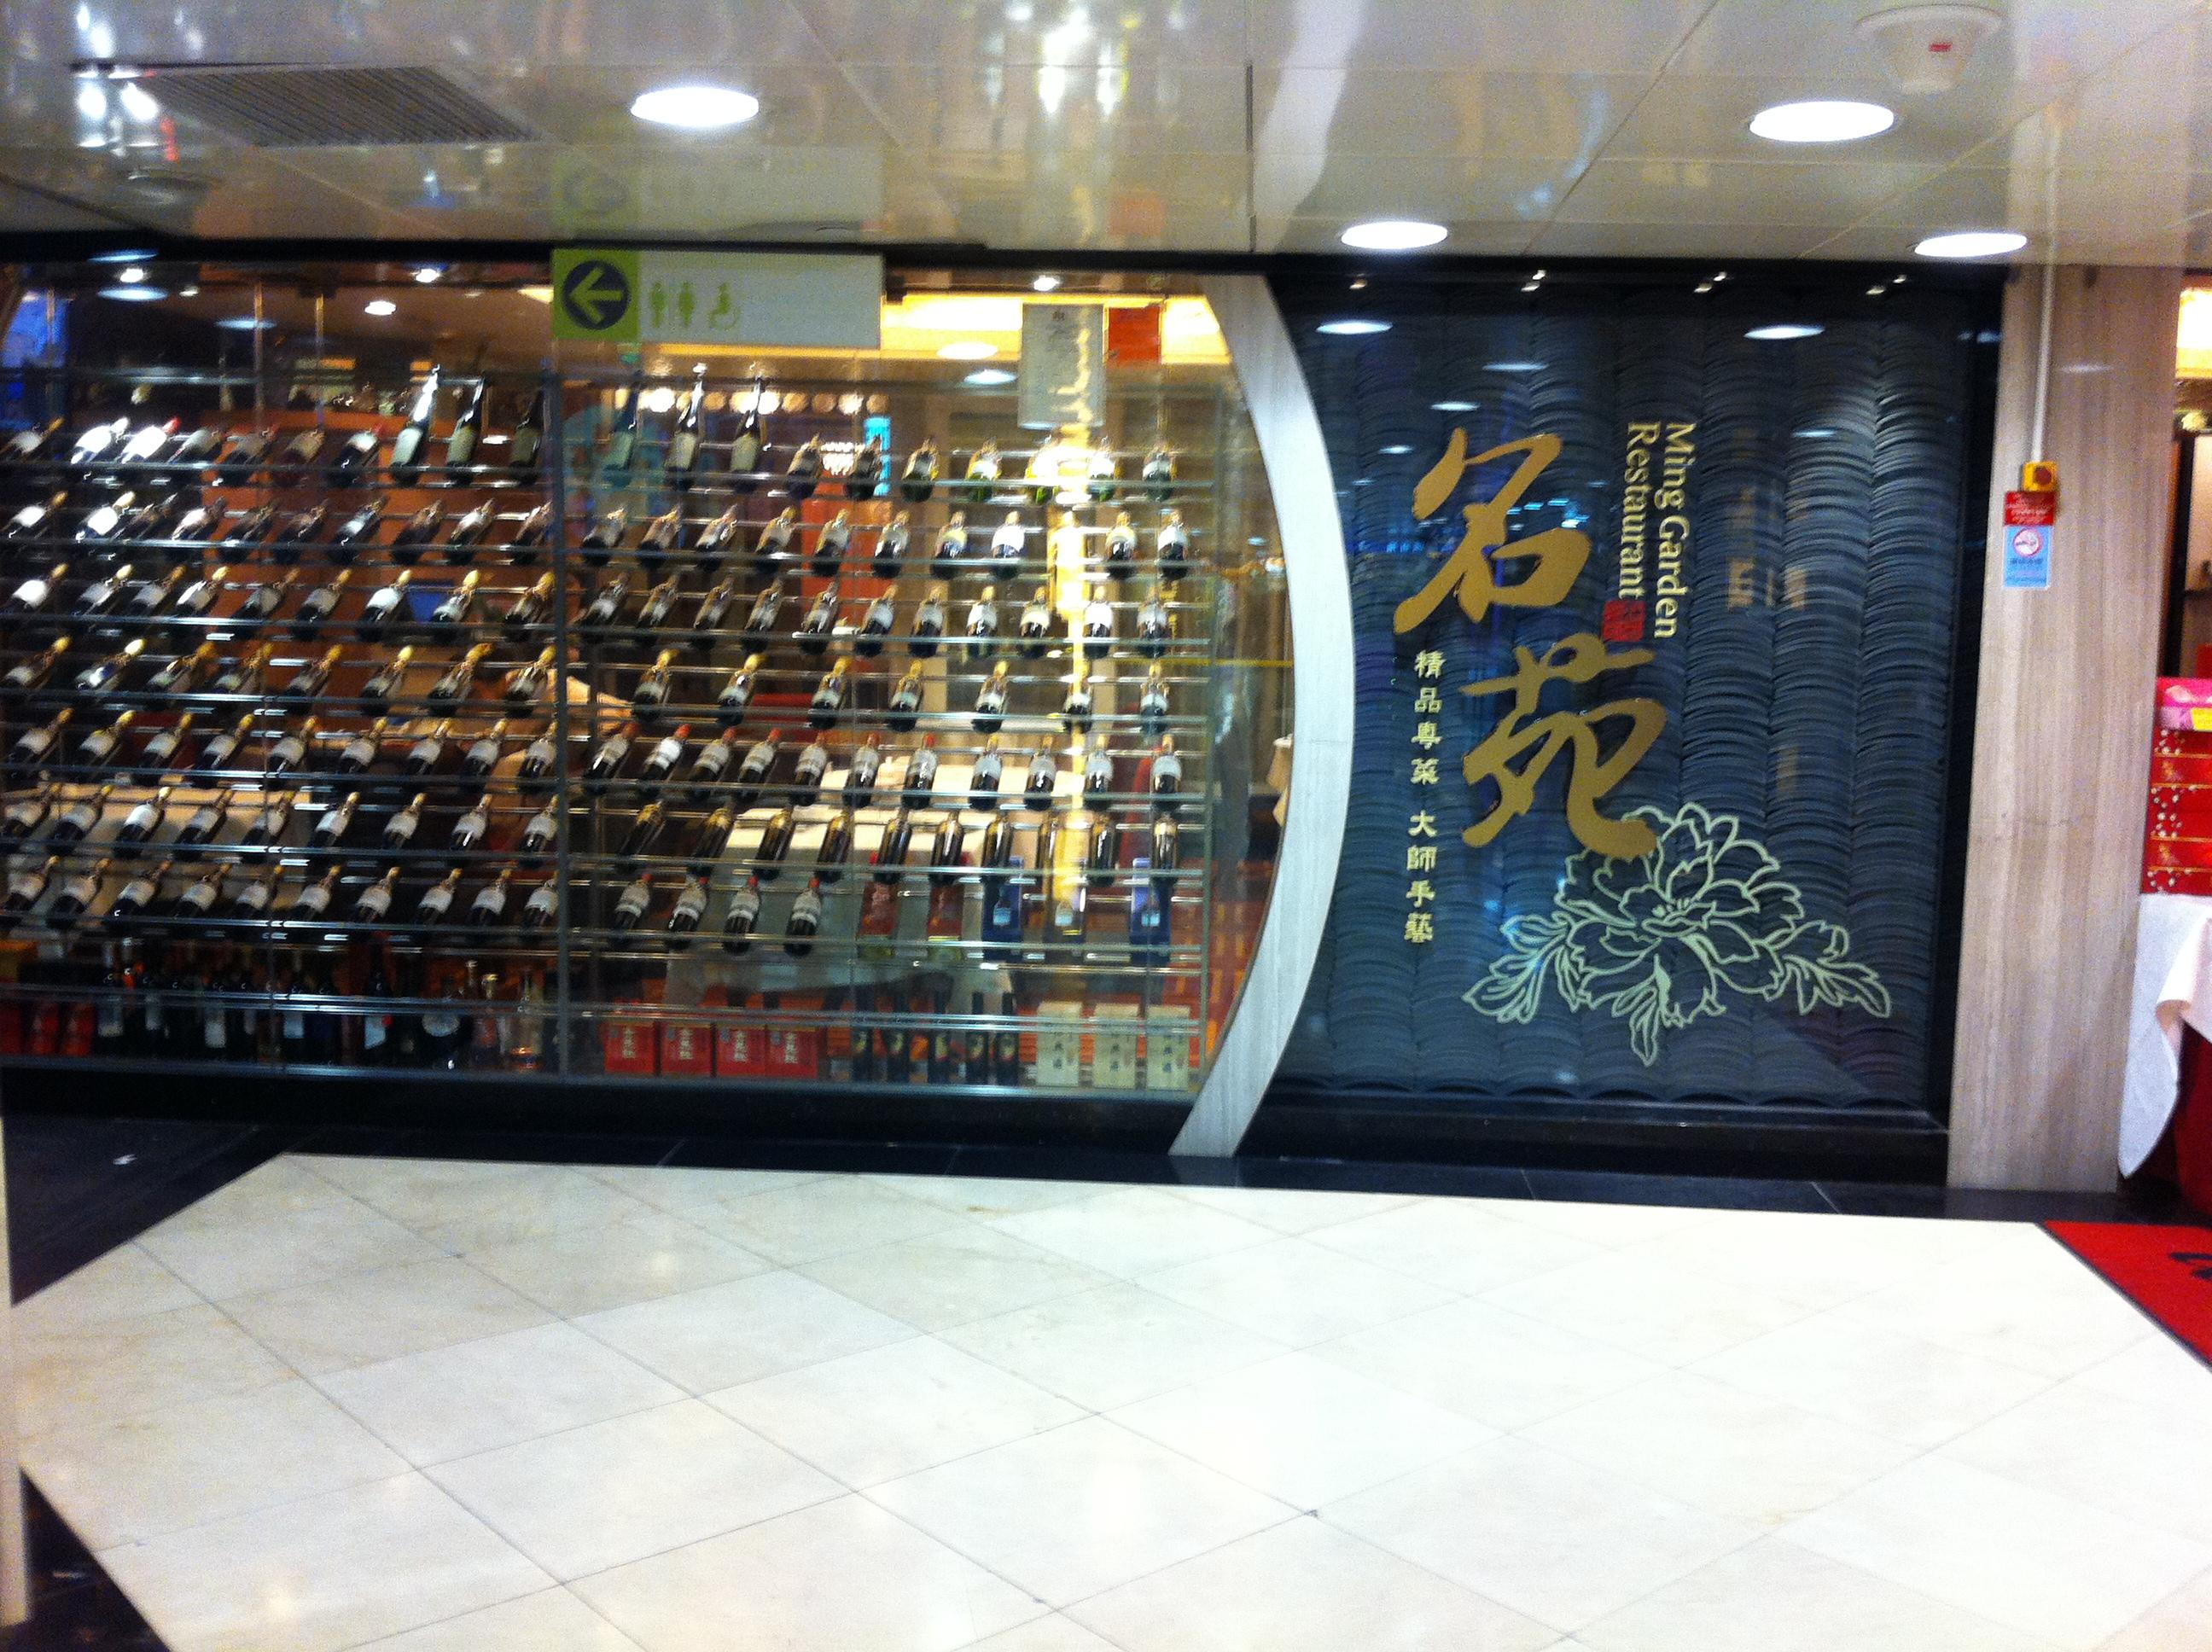 File:HK Tai Kok Tsui evening 新九龍廣場 New Kowloon Plaza Ming Garden Restaurant Dec-2012.JPG - Wikimedia Commons